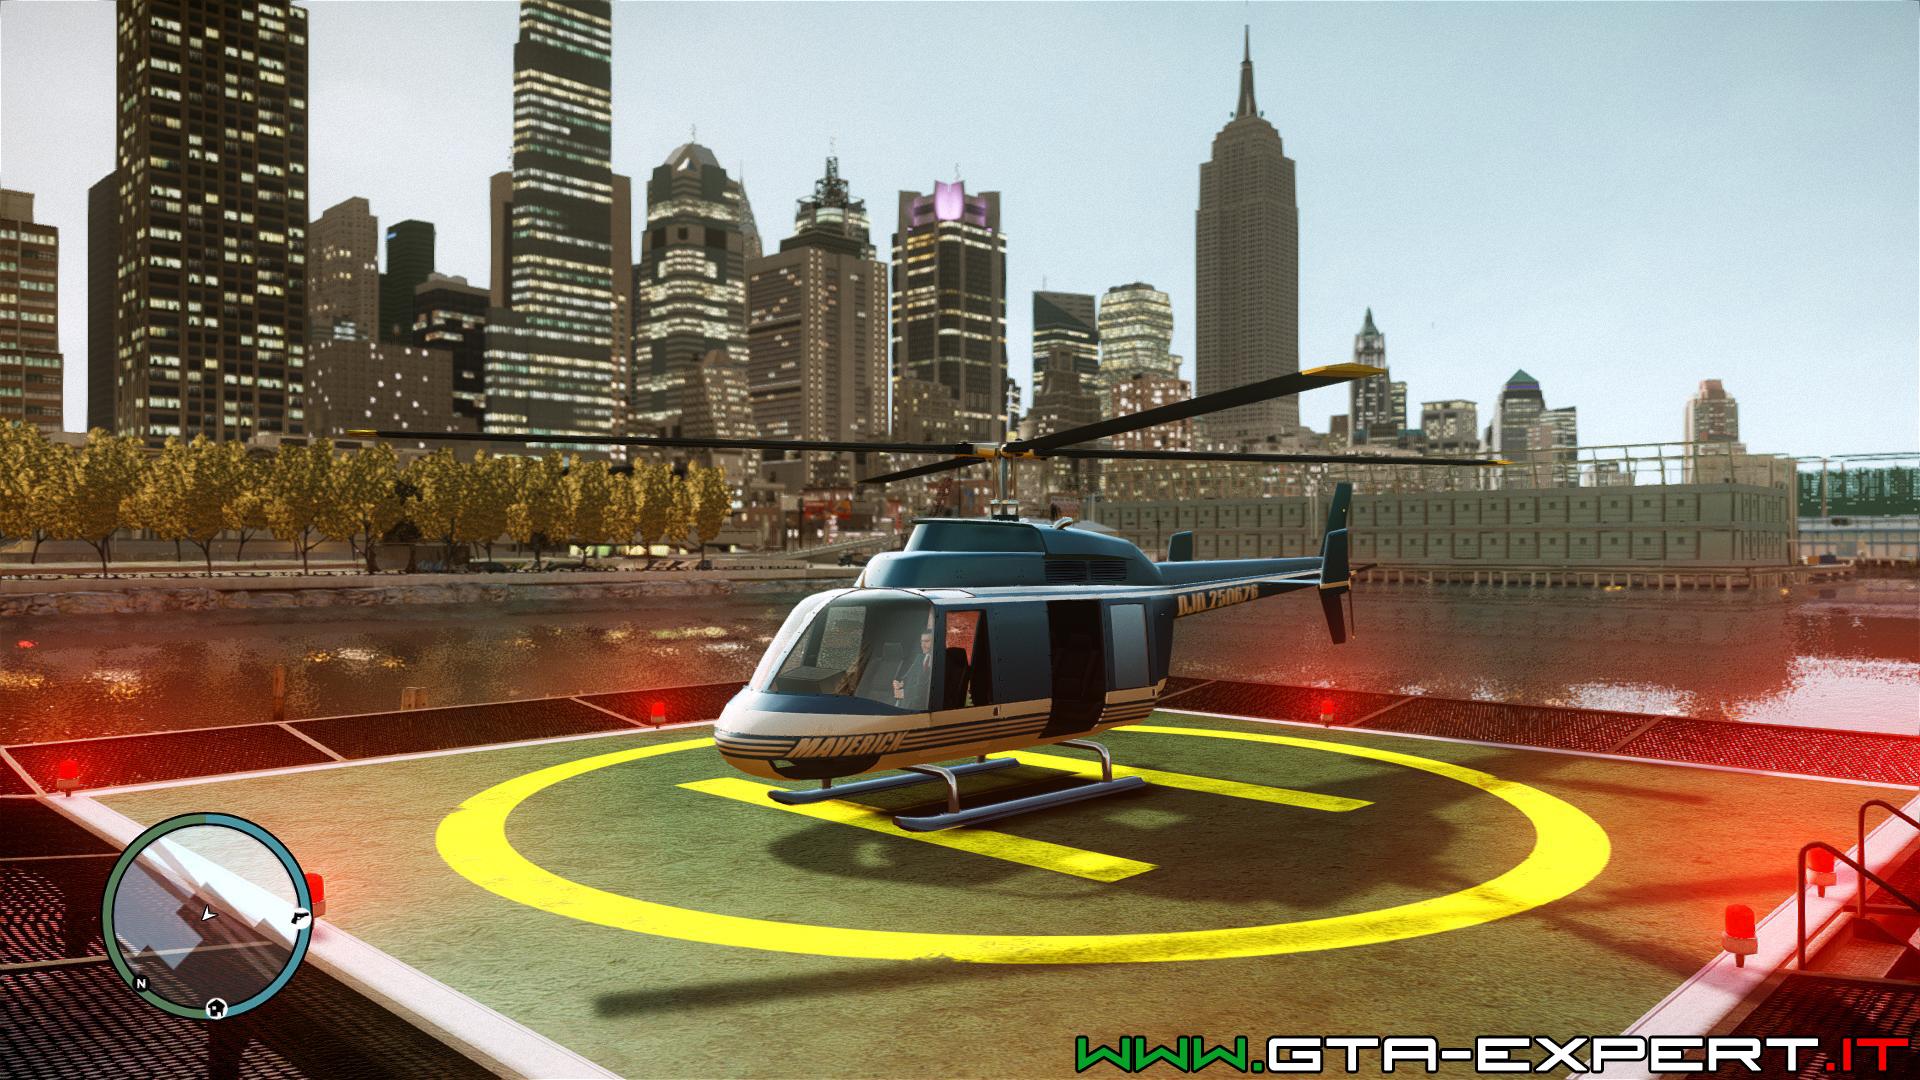 Gta V Elicottero Trucco : Elicotteri gta iv expert